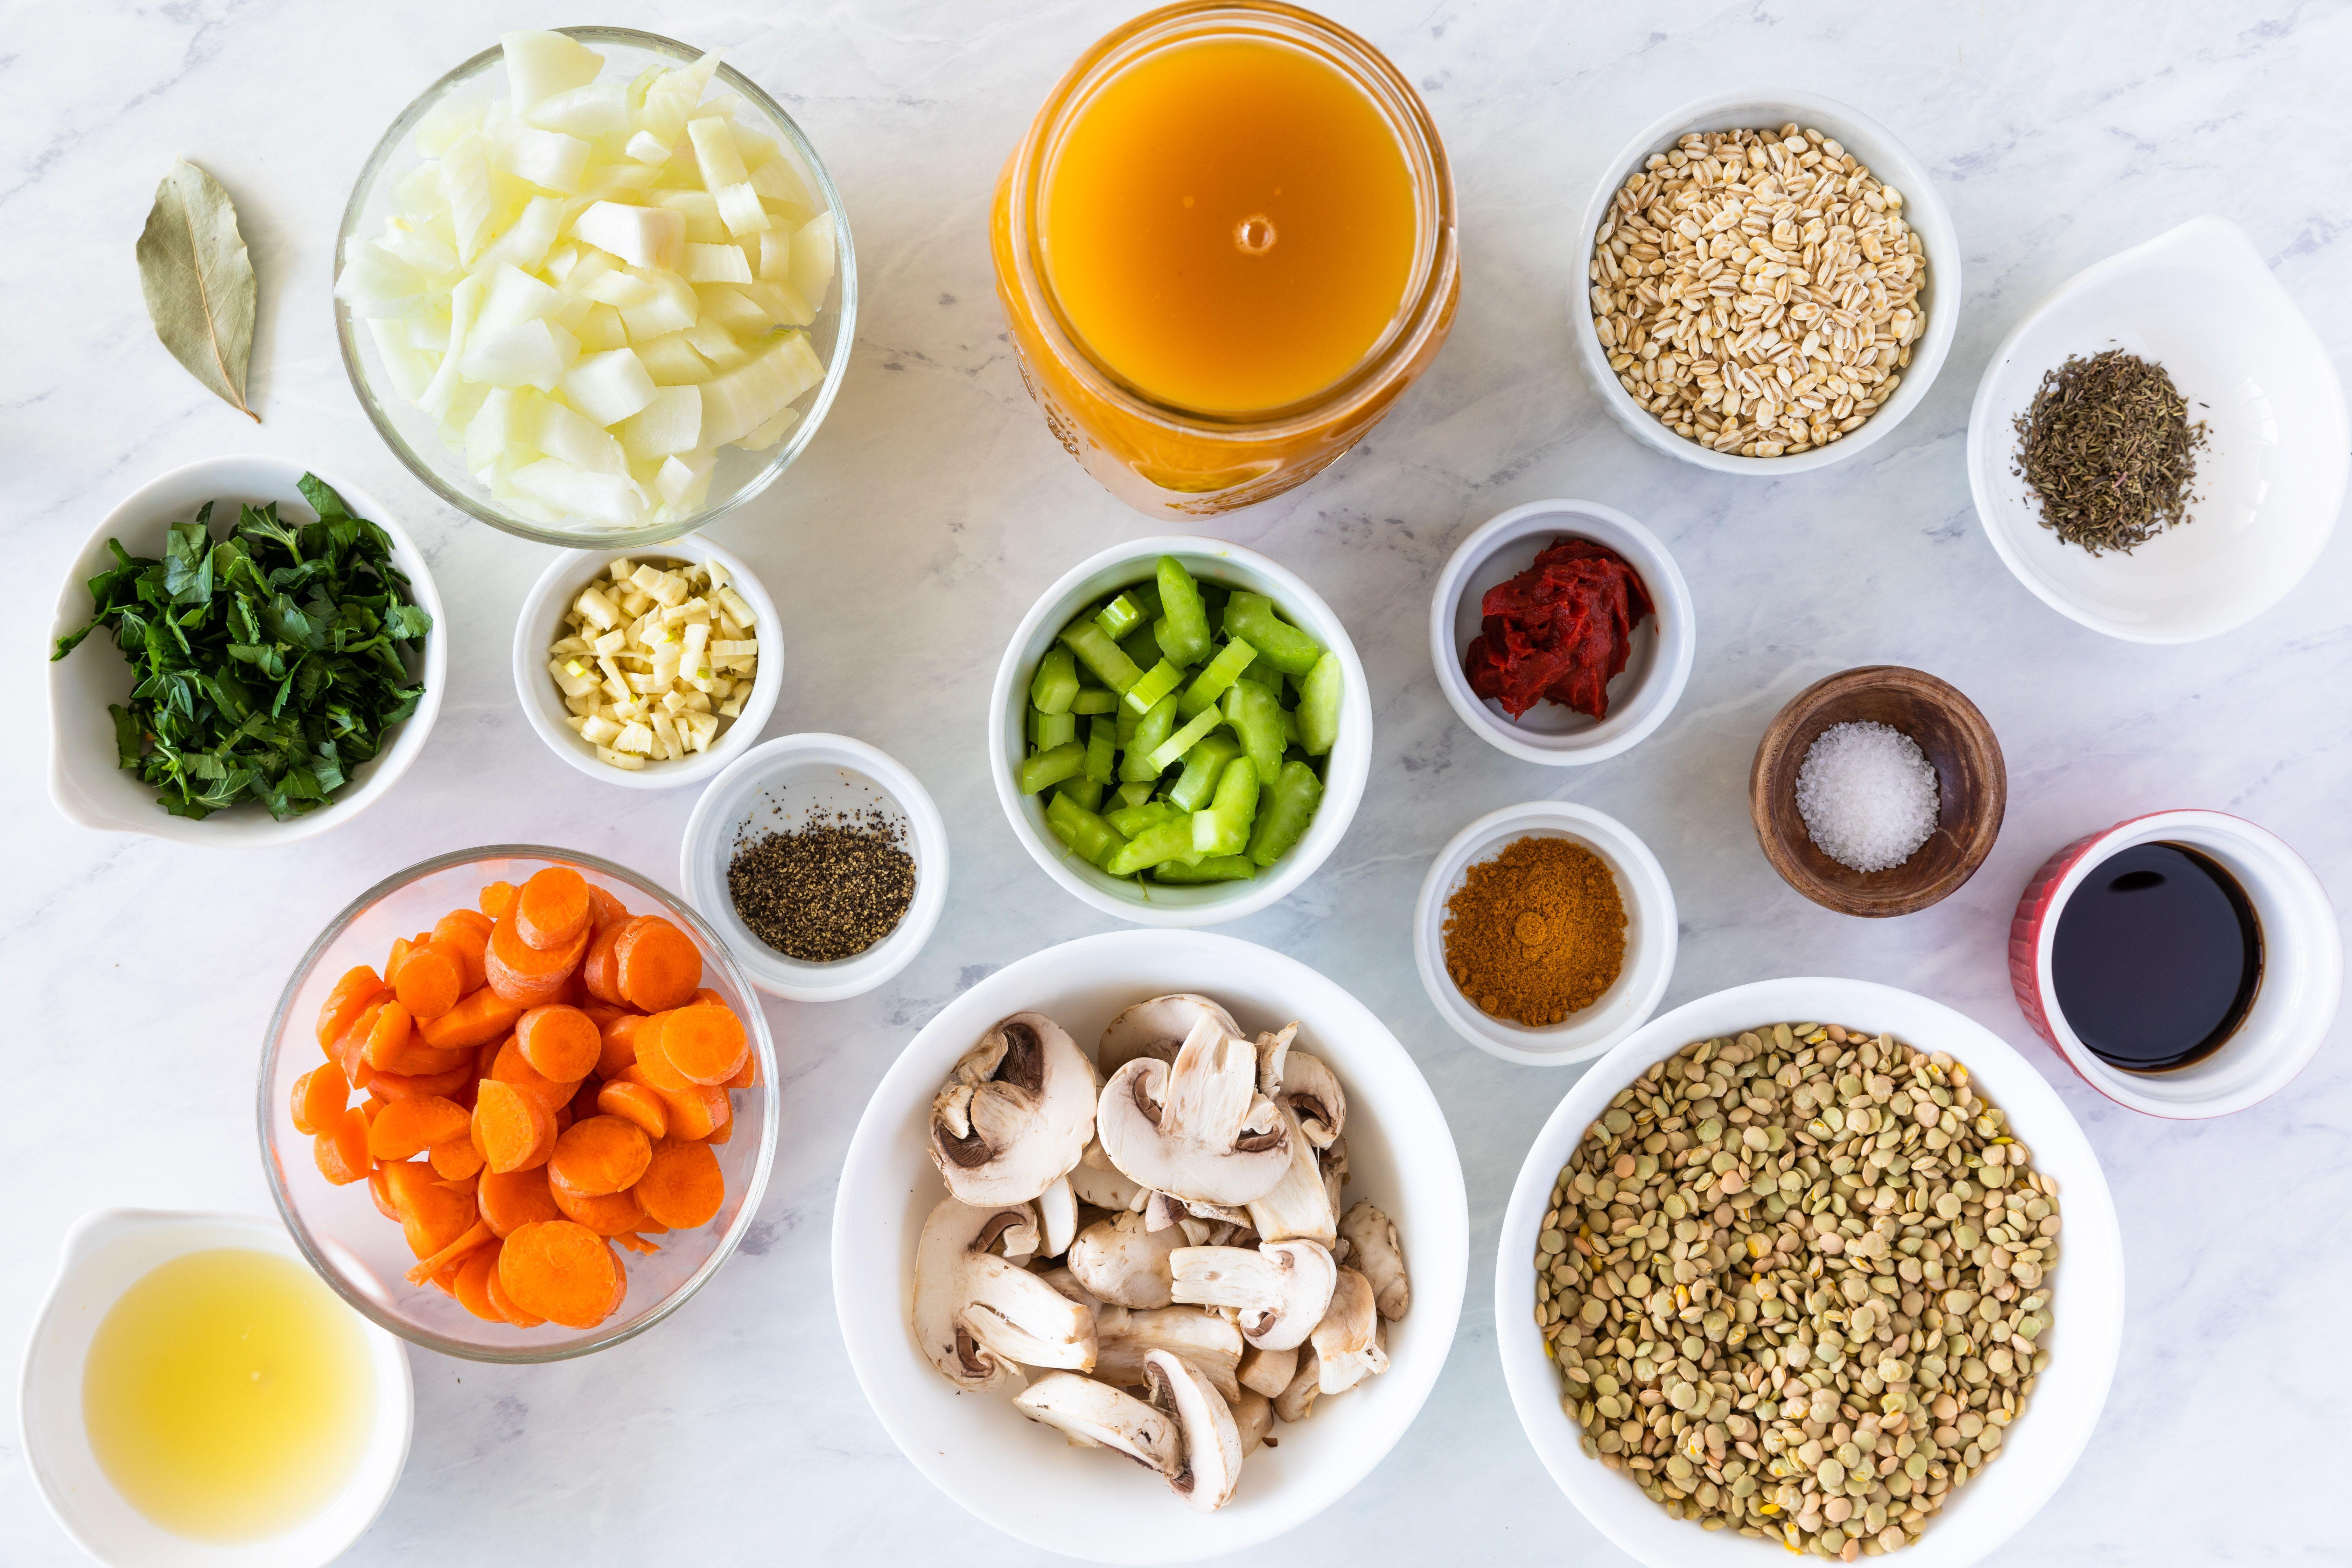 Ingredients for barley vegetable soup with lentils